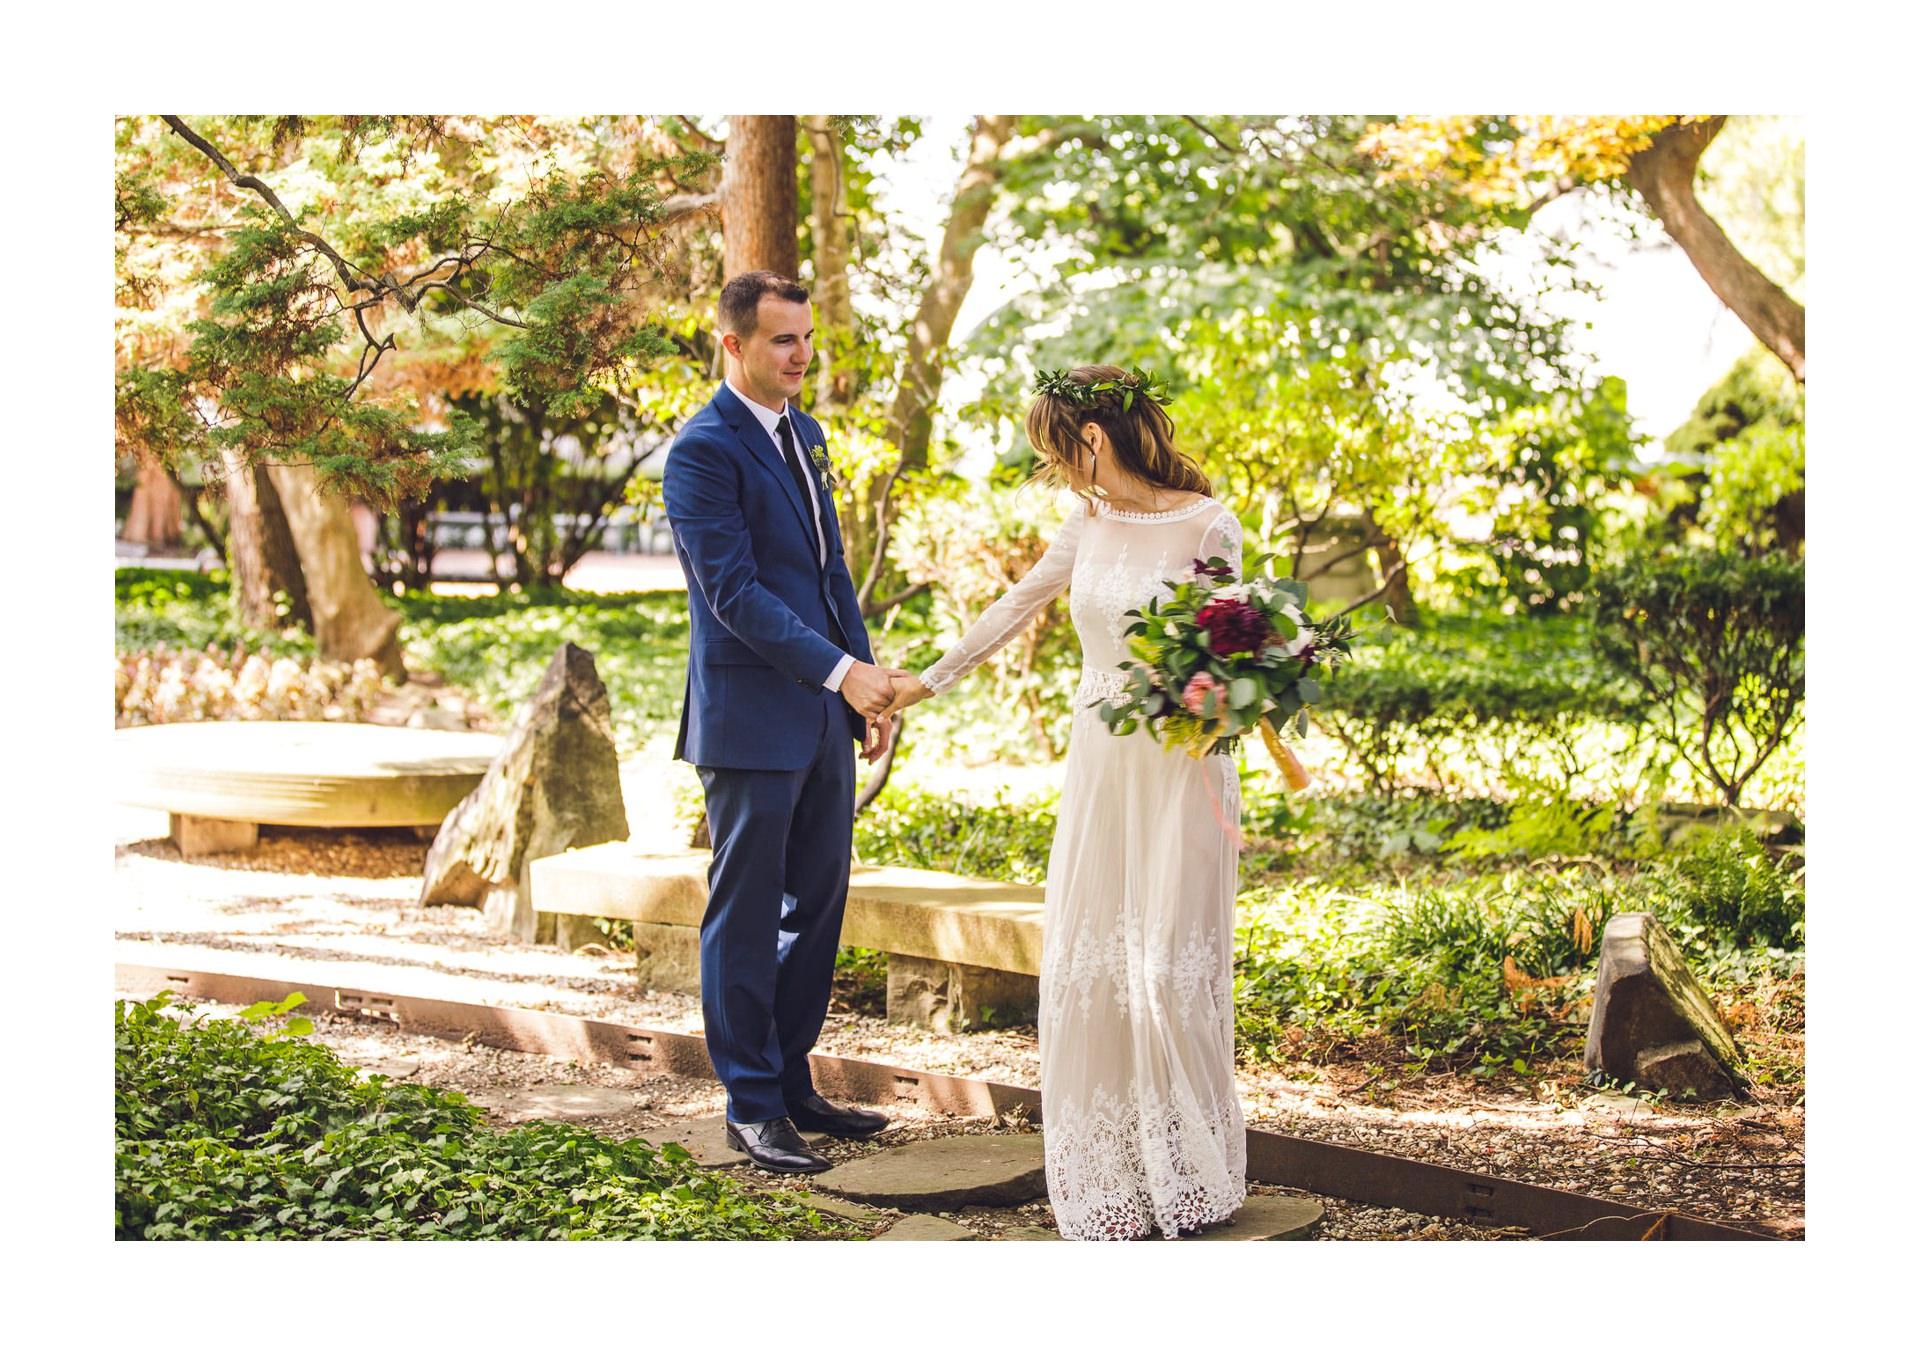 Ariel International Center Wedding Photographer in Cleveland 4.jpg